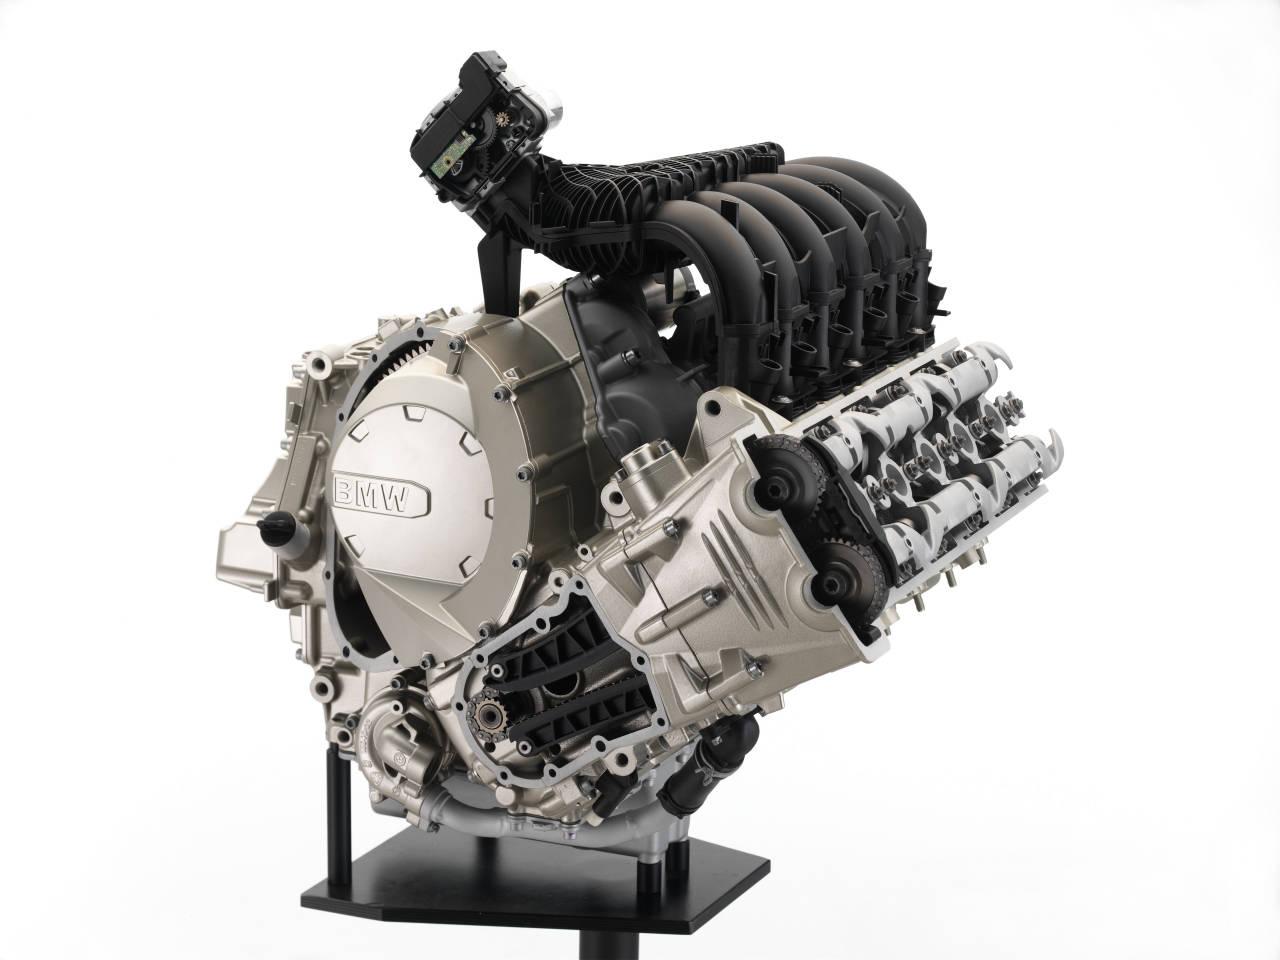 2012-BMW-K1600GT-5.jpg